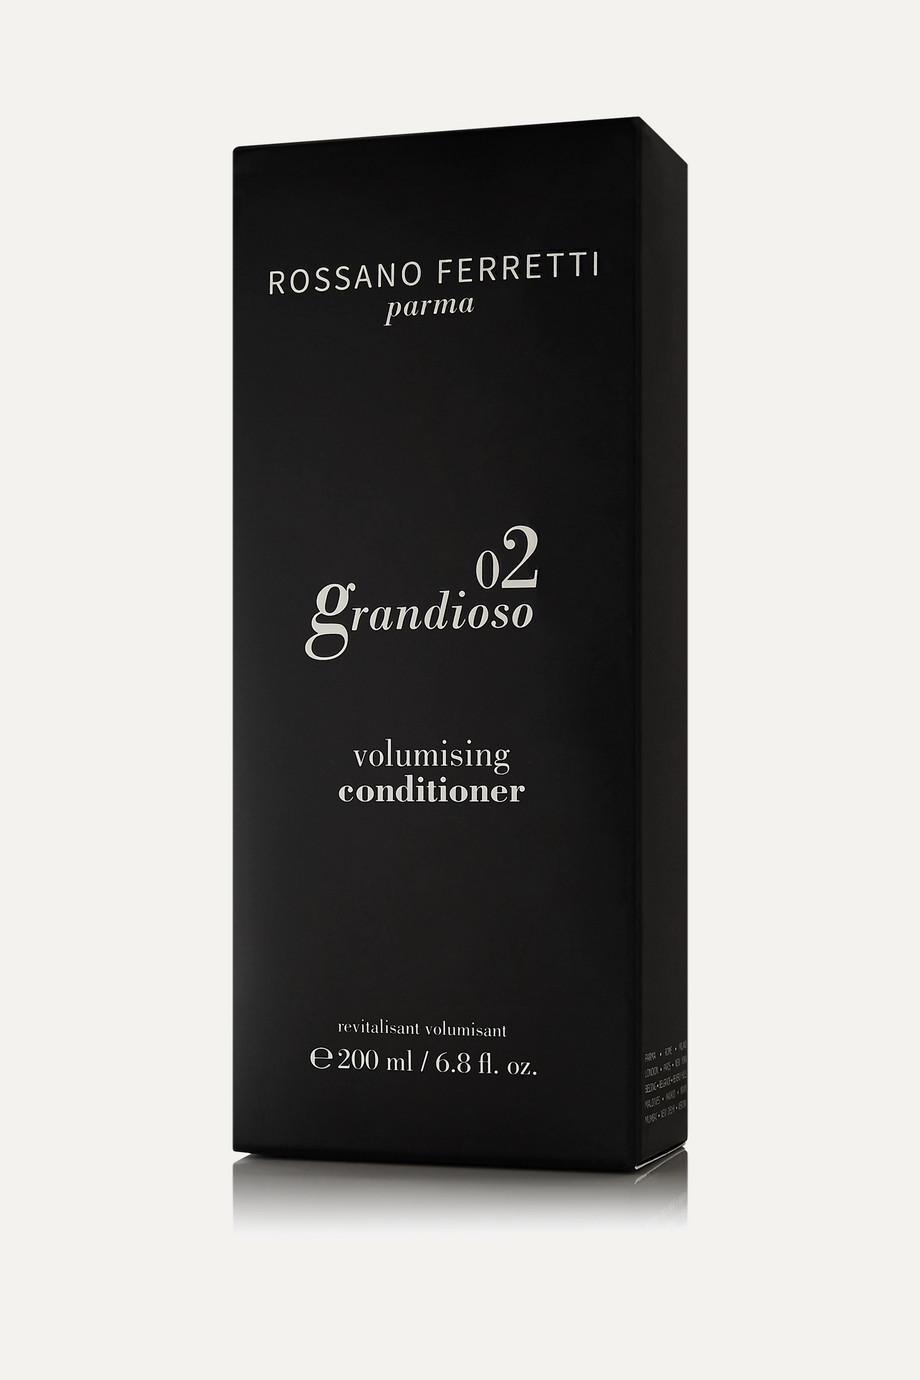 ROSSANO FERRETTI Parma Grandioso Volumising Conditioner, 200ml